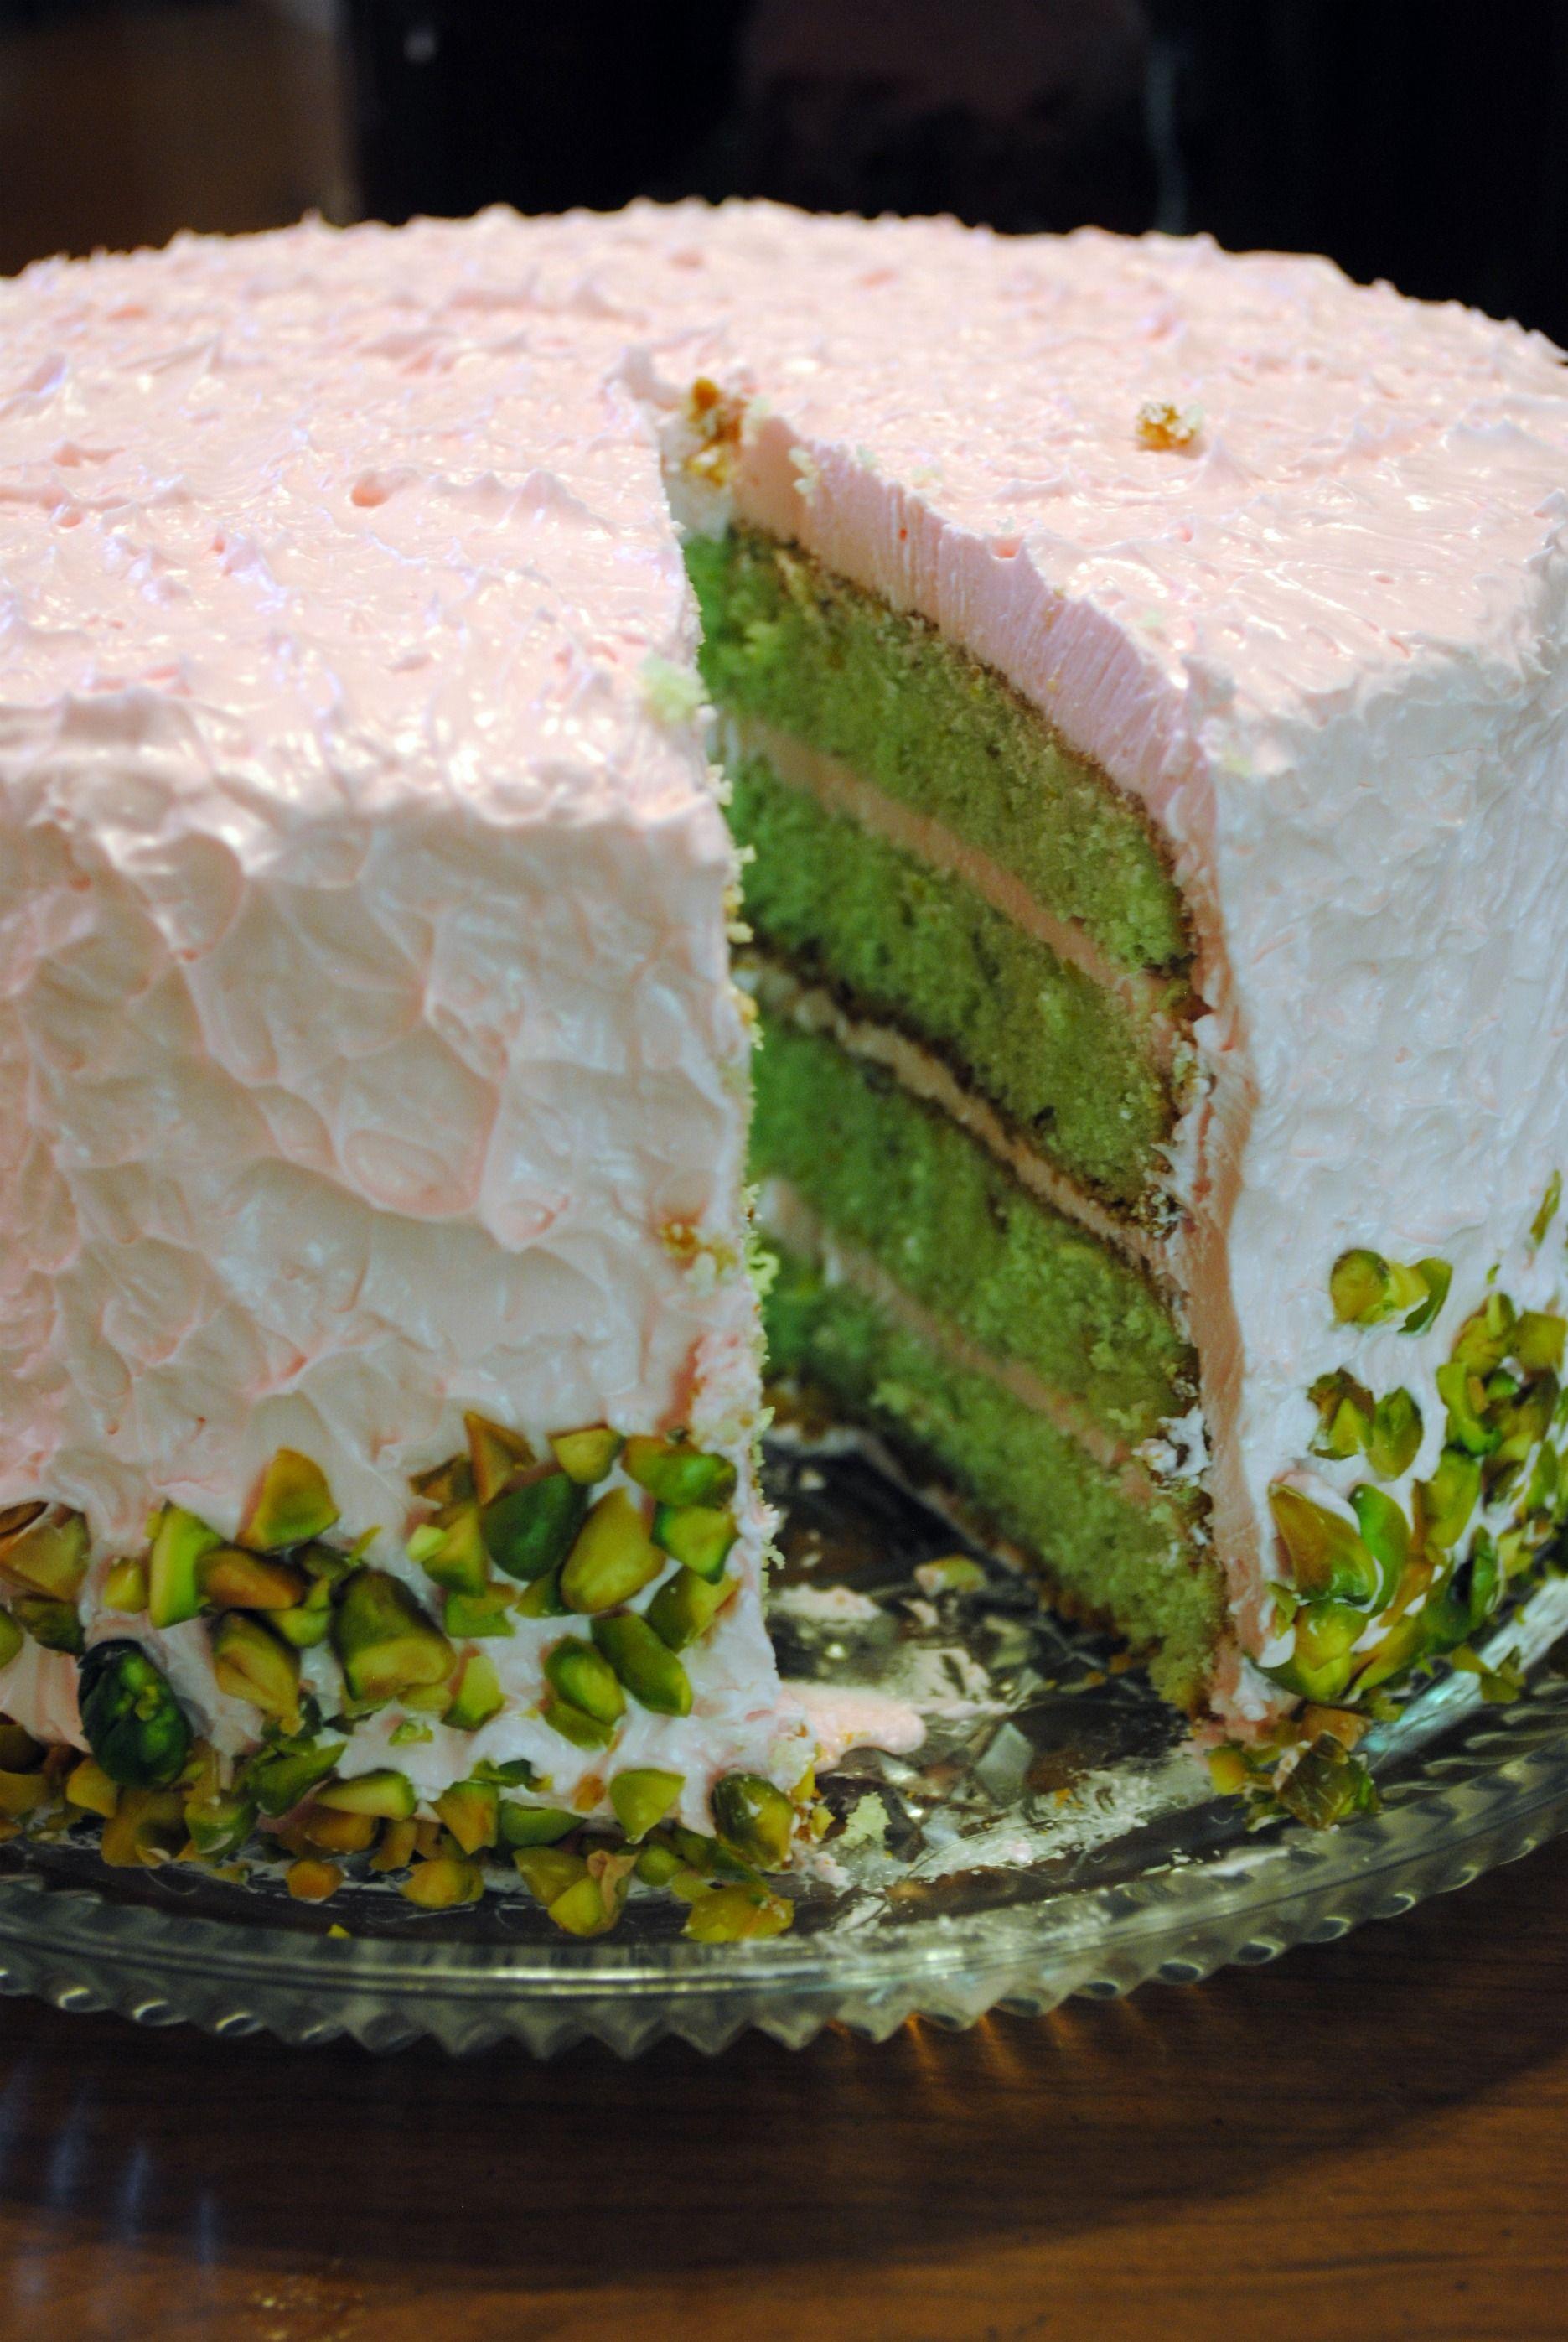 Pistachio Cake (a.k.a. Watergate Cake) with White Chocolate Swiss Meringue Buttercream